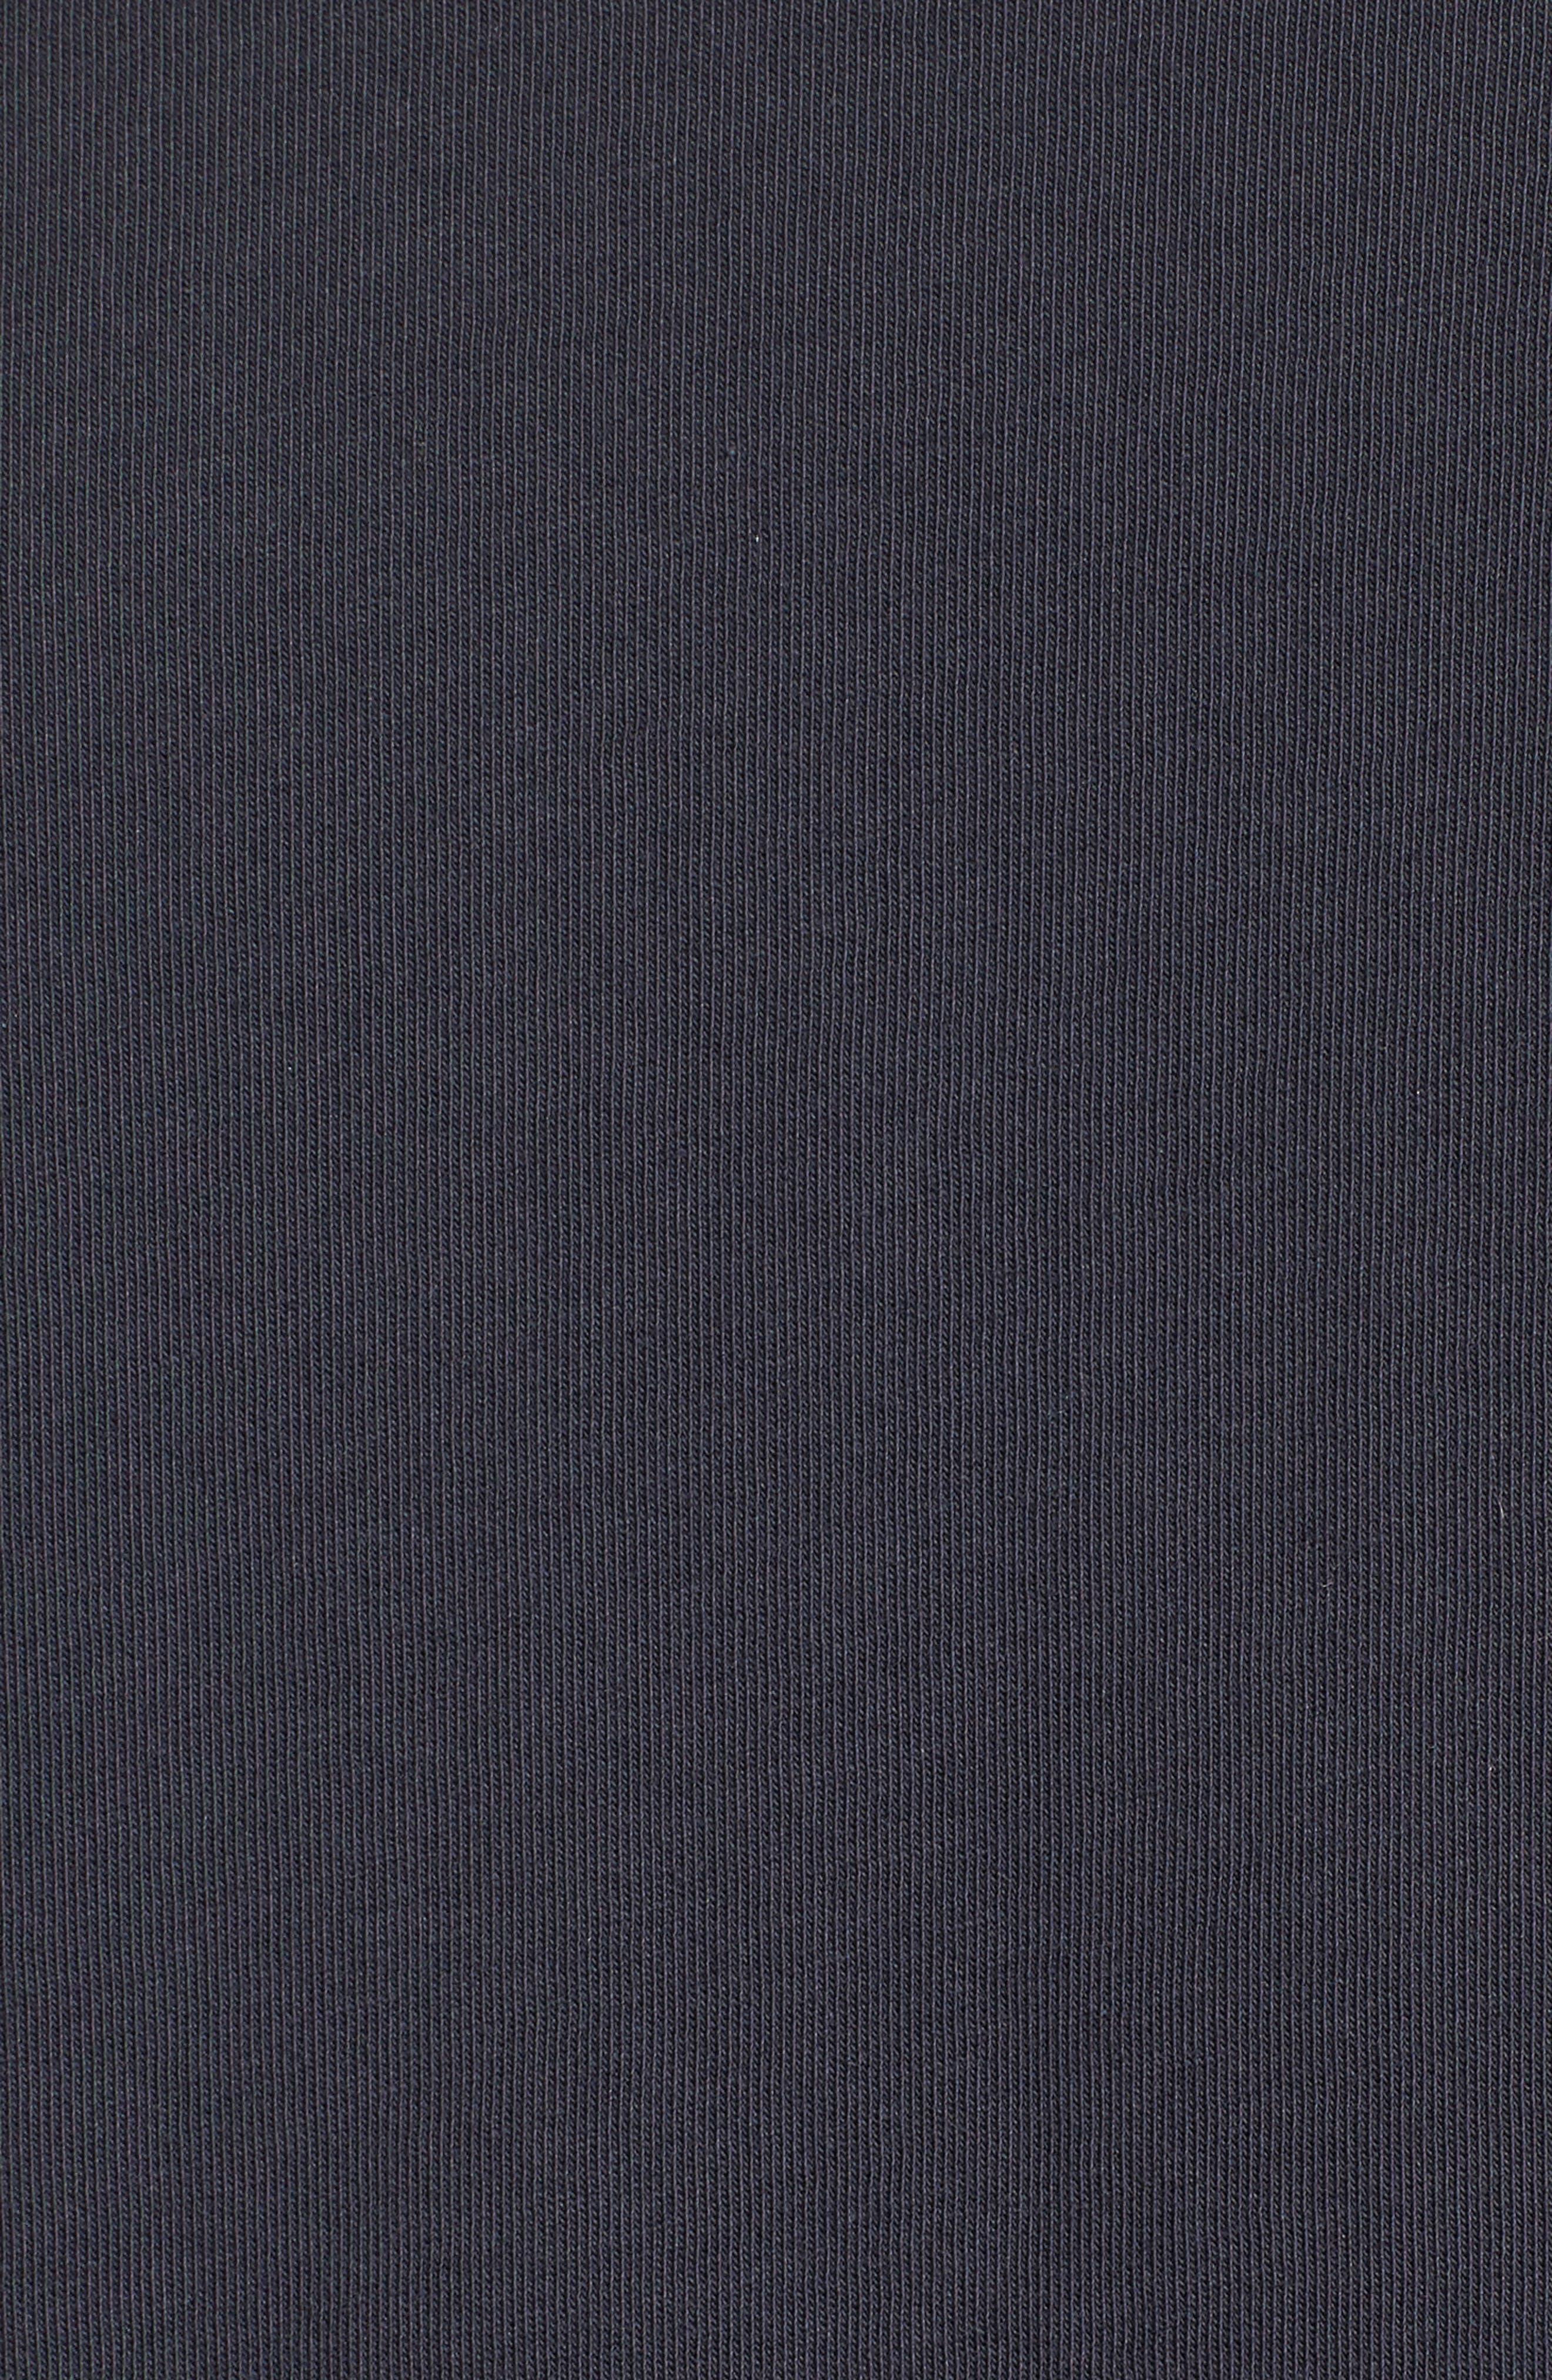 Alternate Image 5  - Levi's® The Authentic Cotton Tee